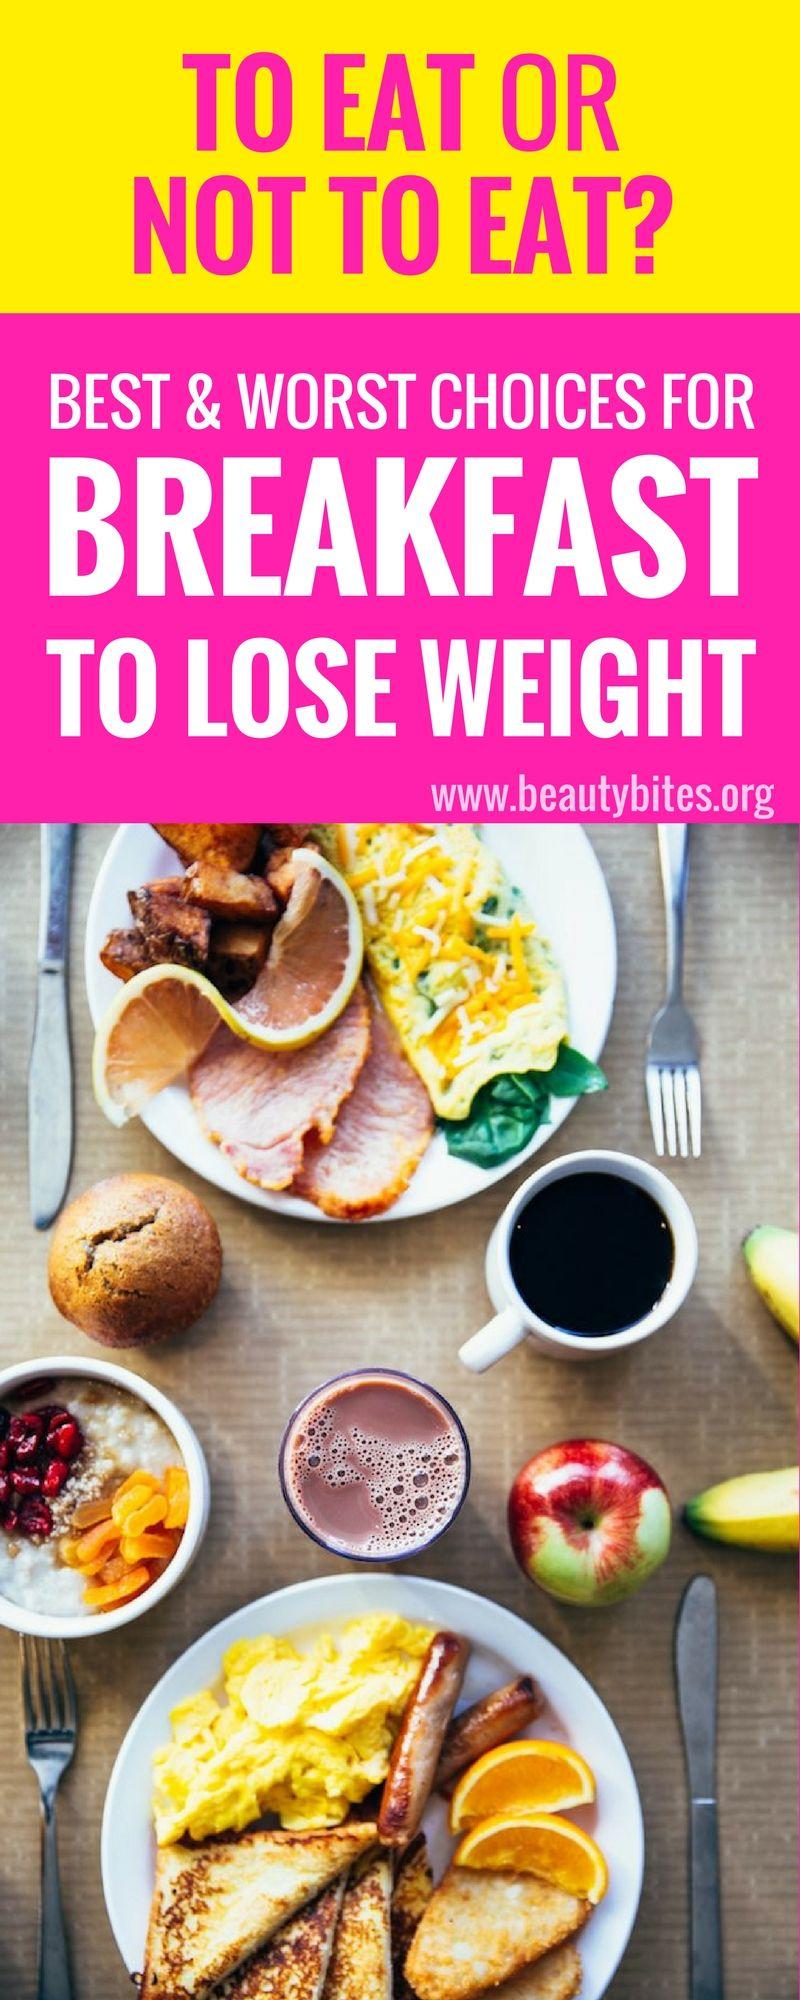 diet plans lower cholesterol